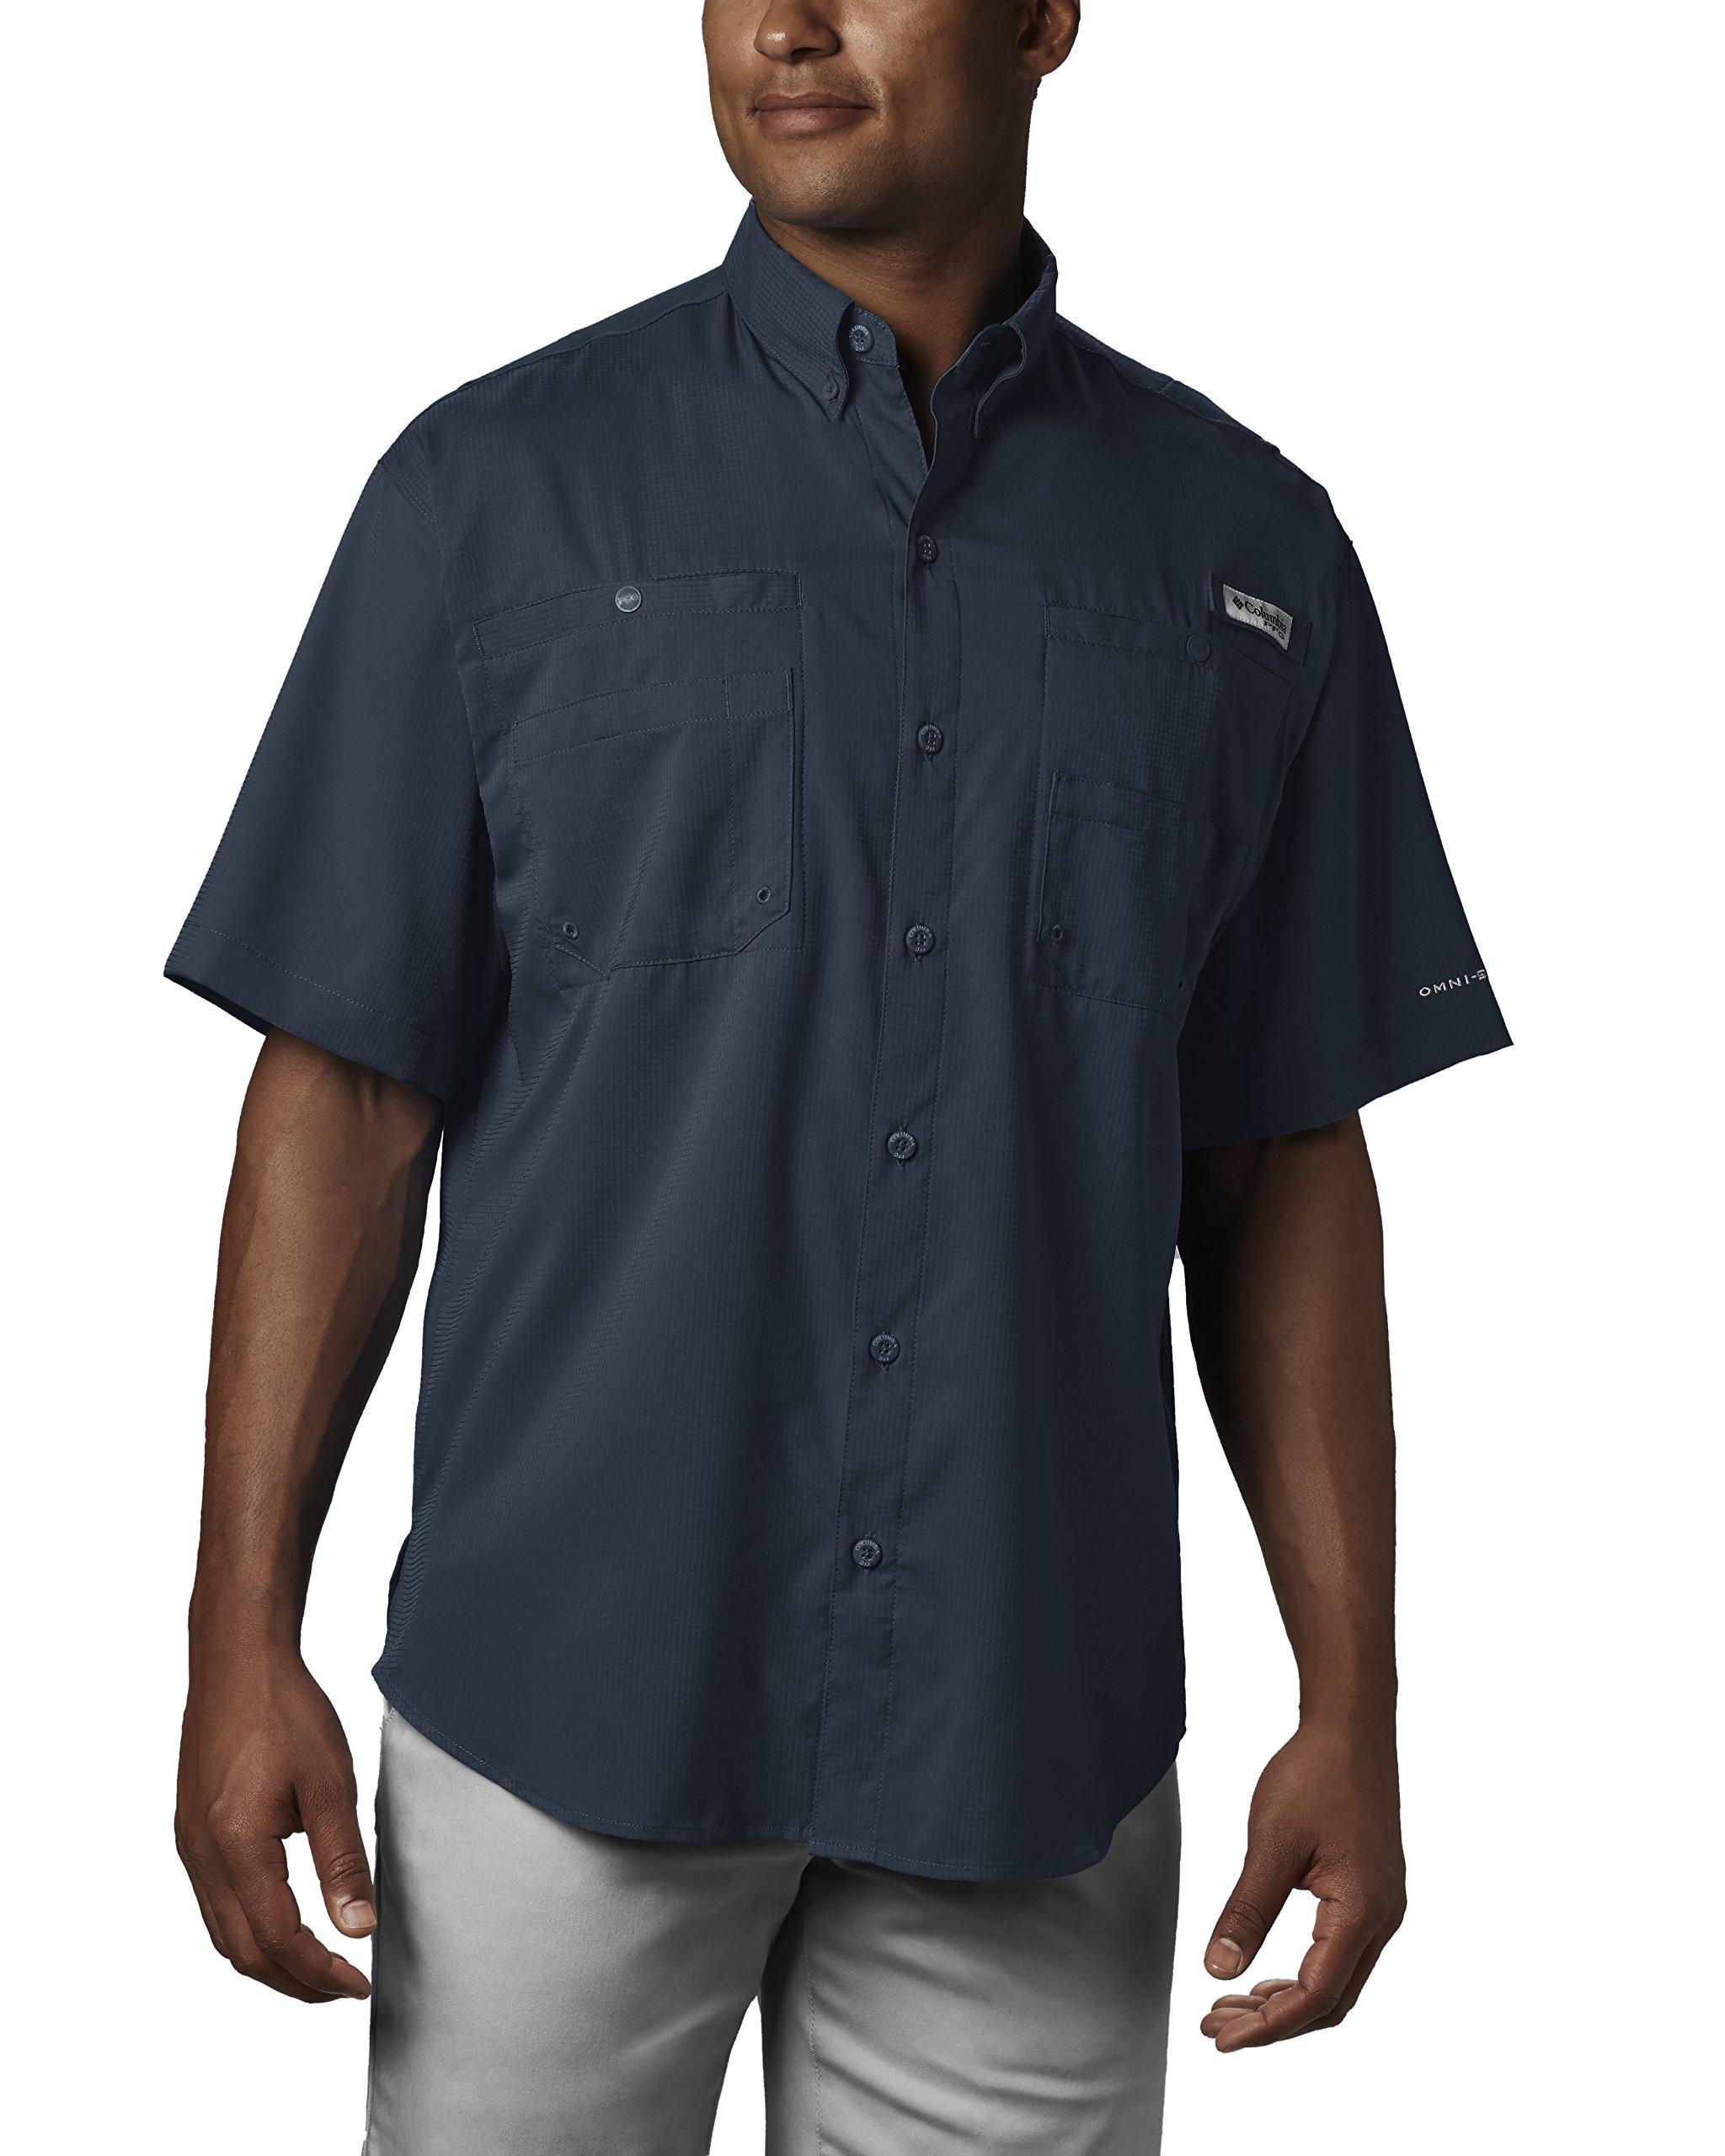 Columbia Men's Tamiami II Short Sleeve Fishing Shirt, Collegiate Navy, X-Small by Columbia (Image #1)